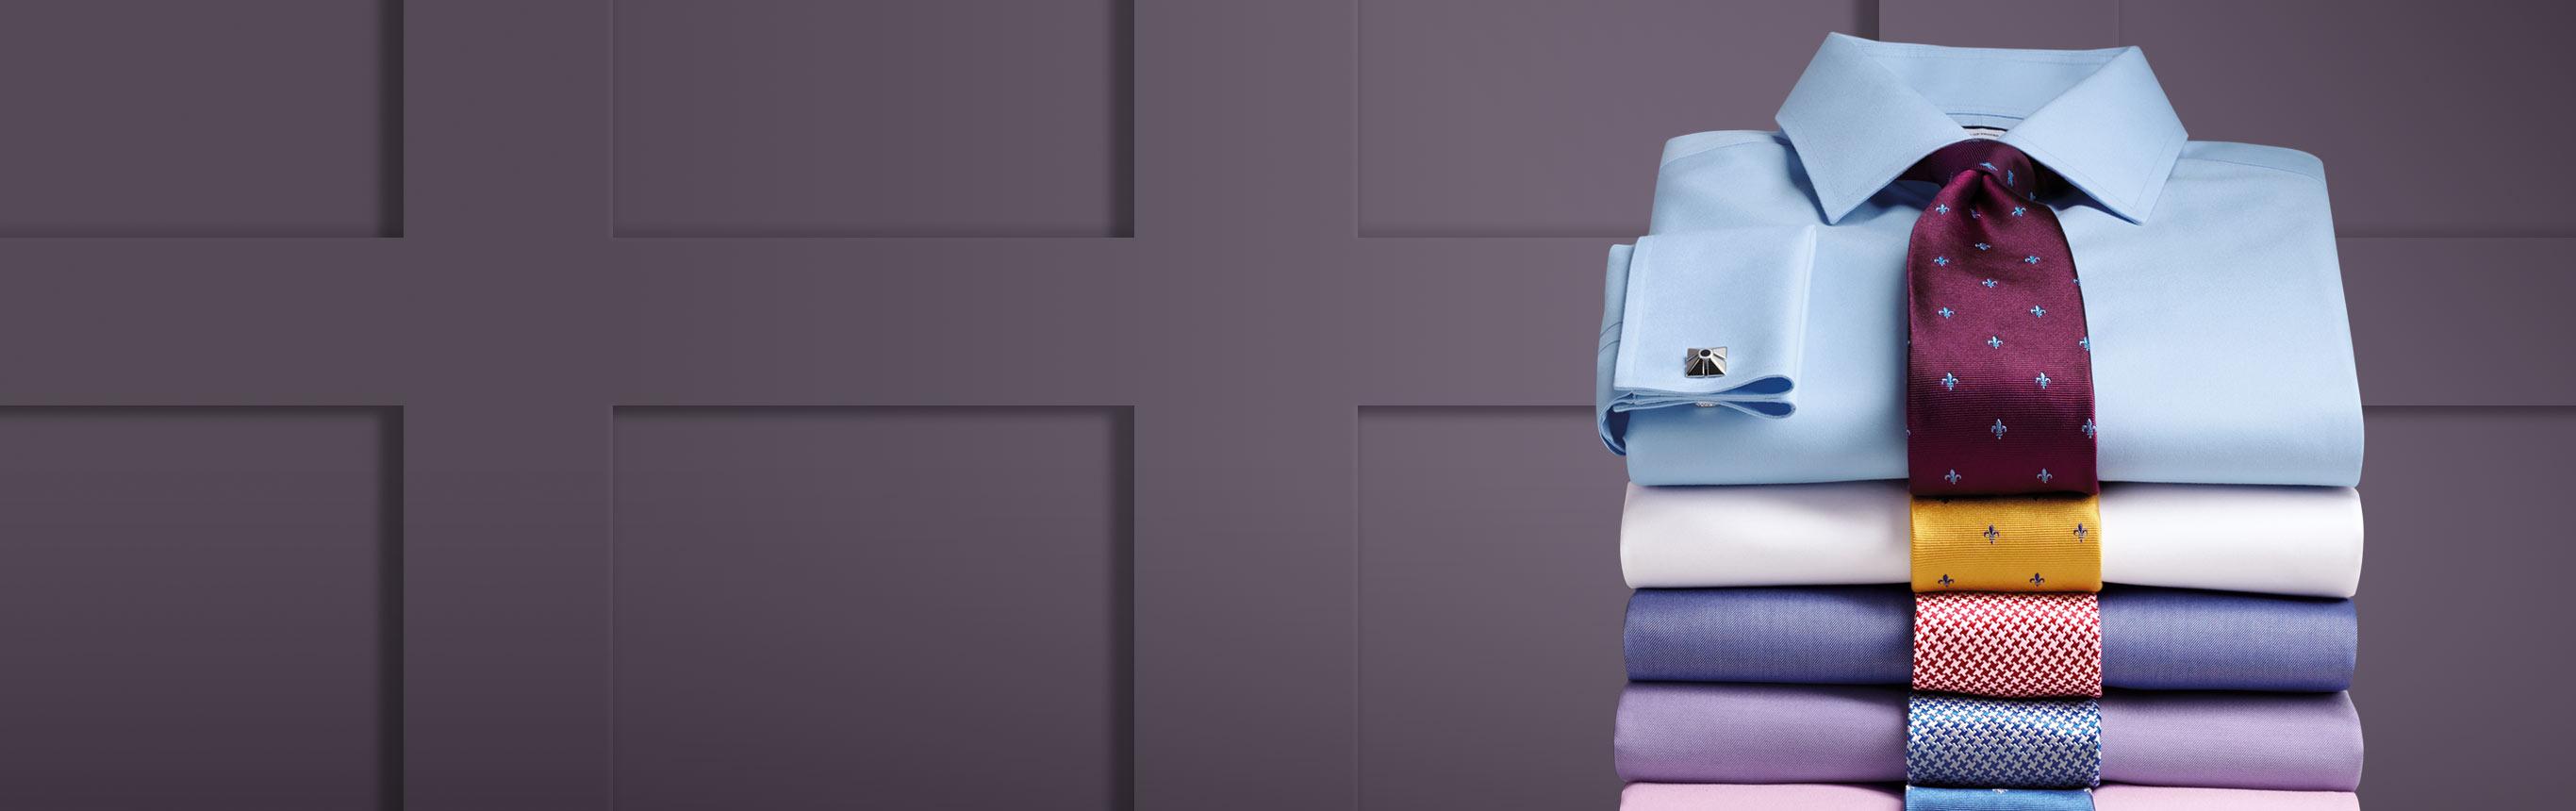 Image of twill shirts